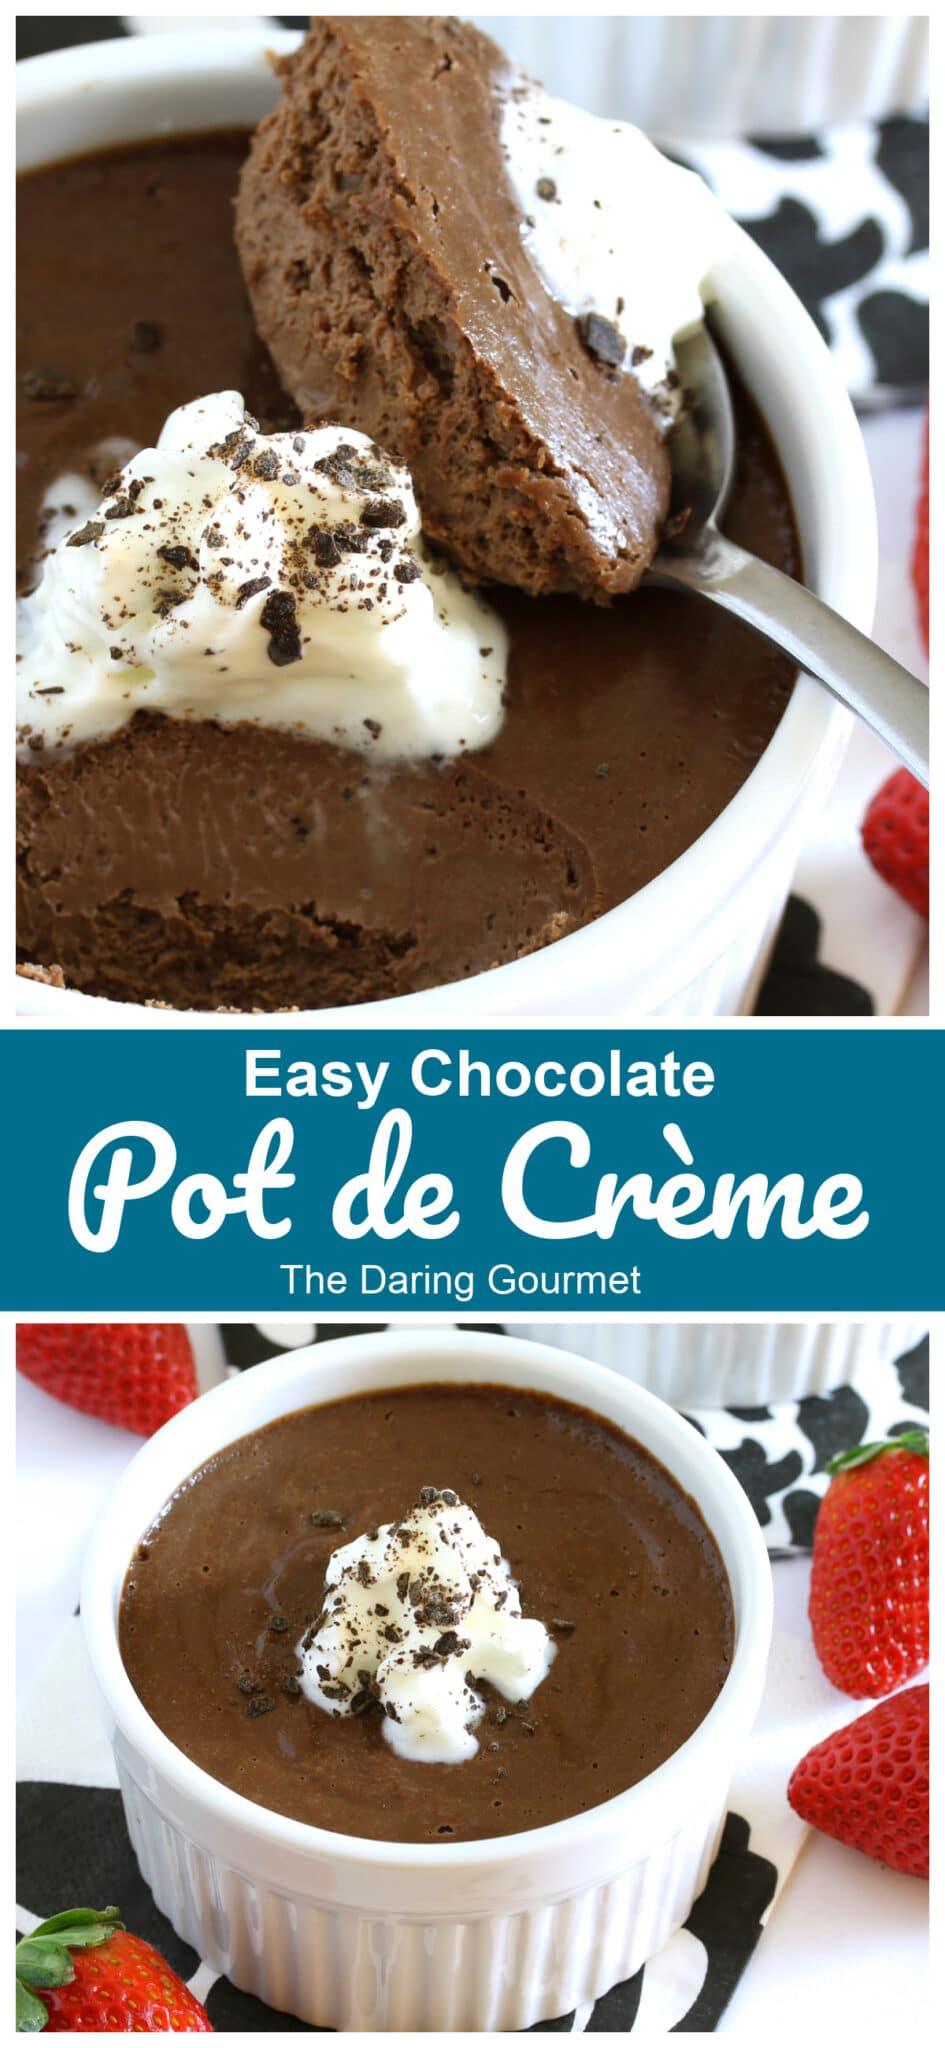 pot de creme recipe easy chocolate fast French dessert